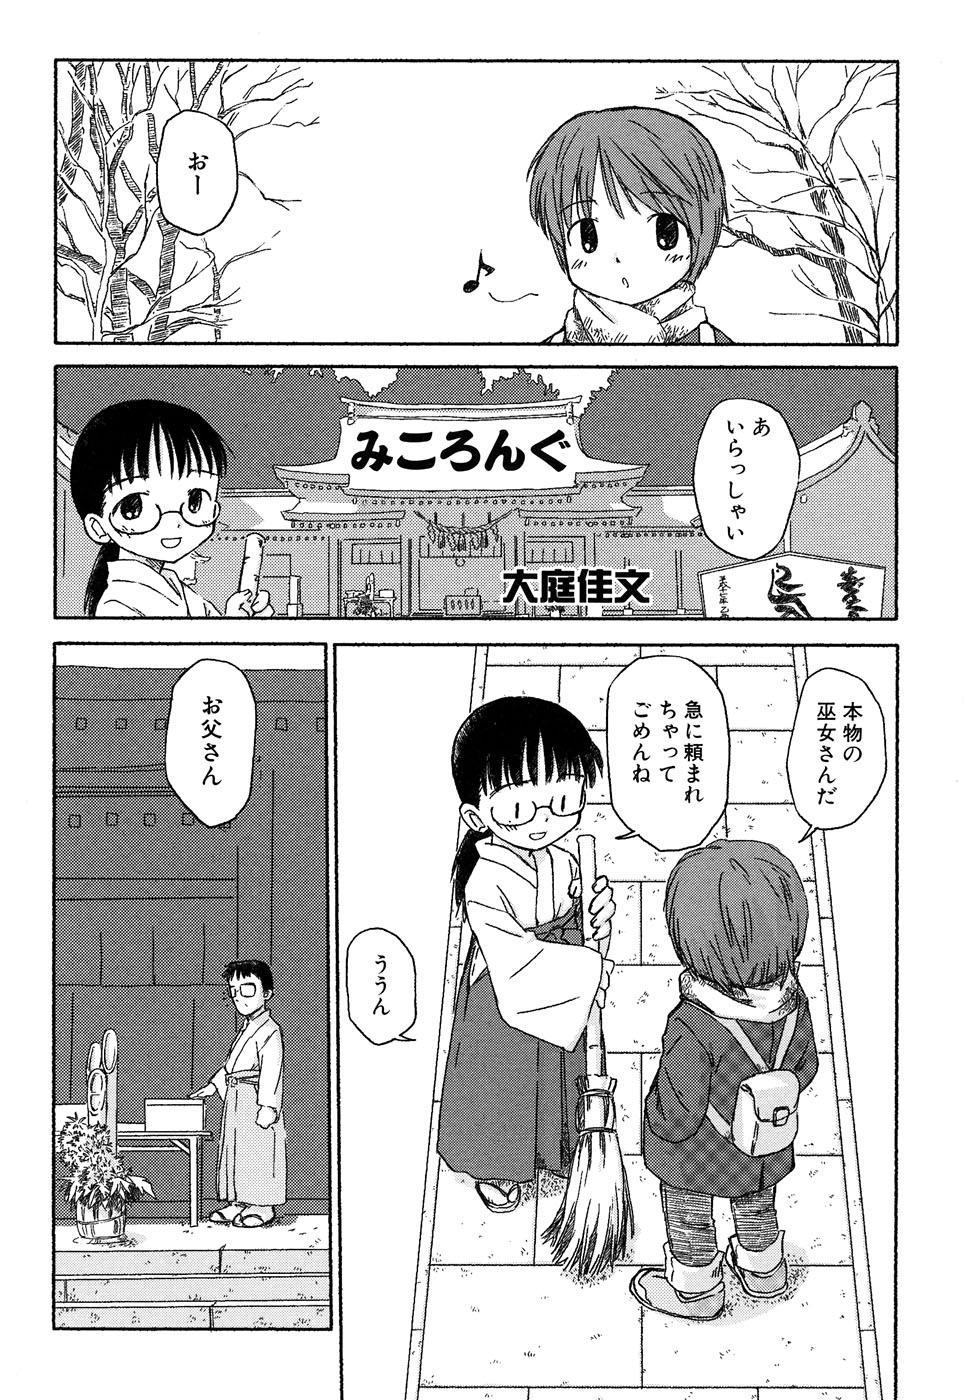 Fechikko VS Series ROUND.2 Miko San VS Maid San 59